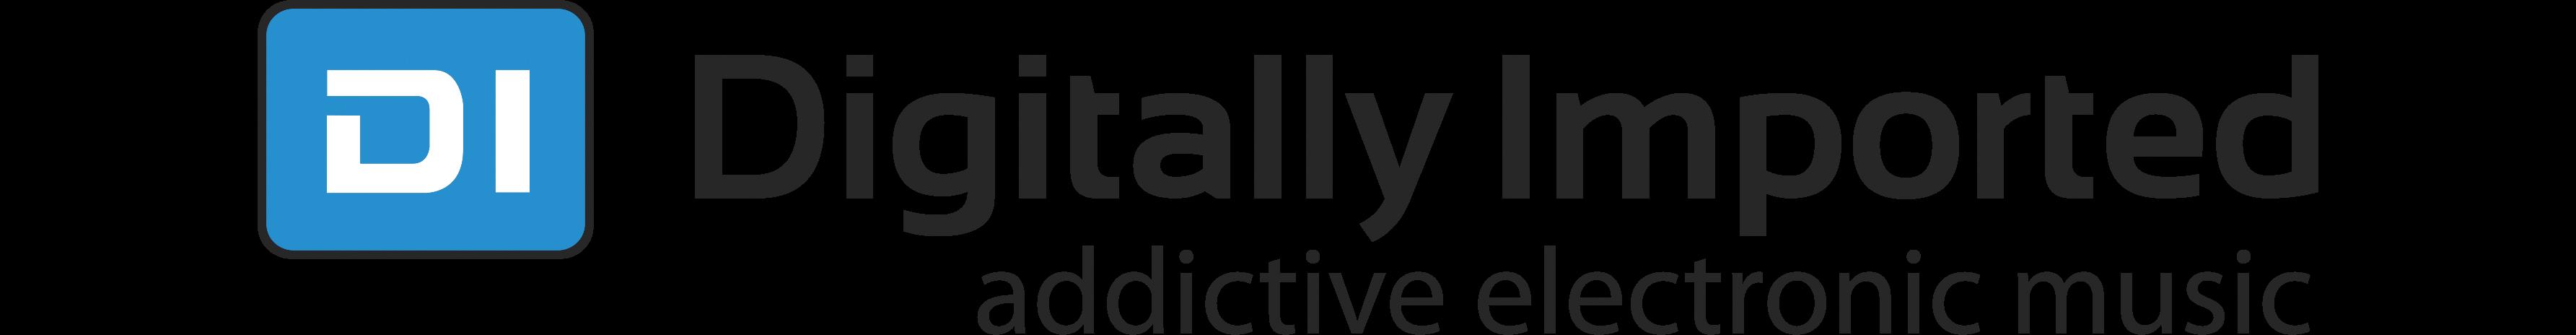 digitally-imported-logo